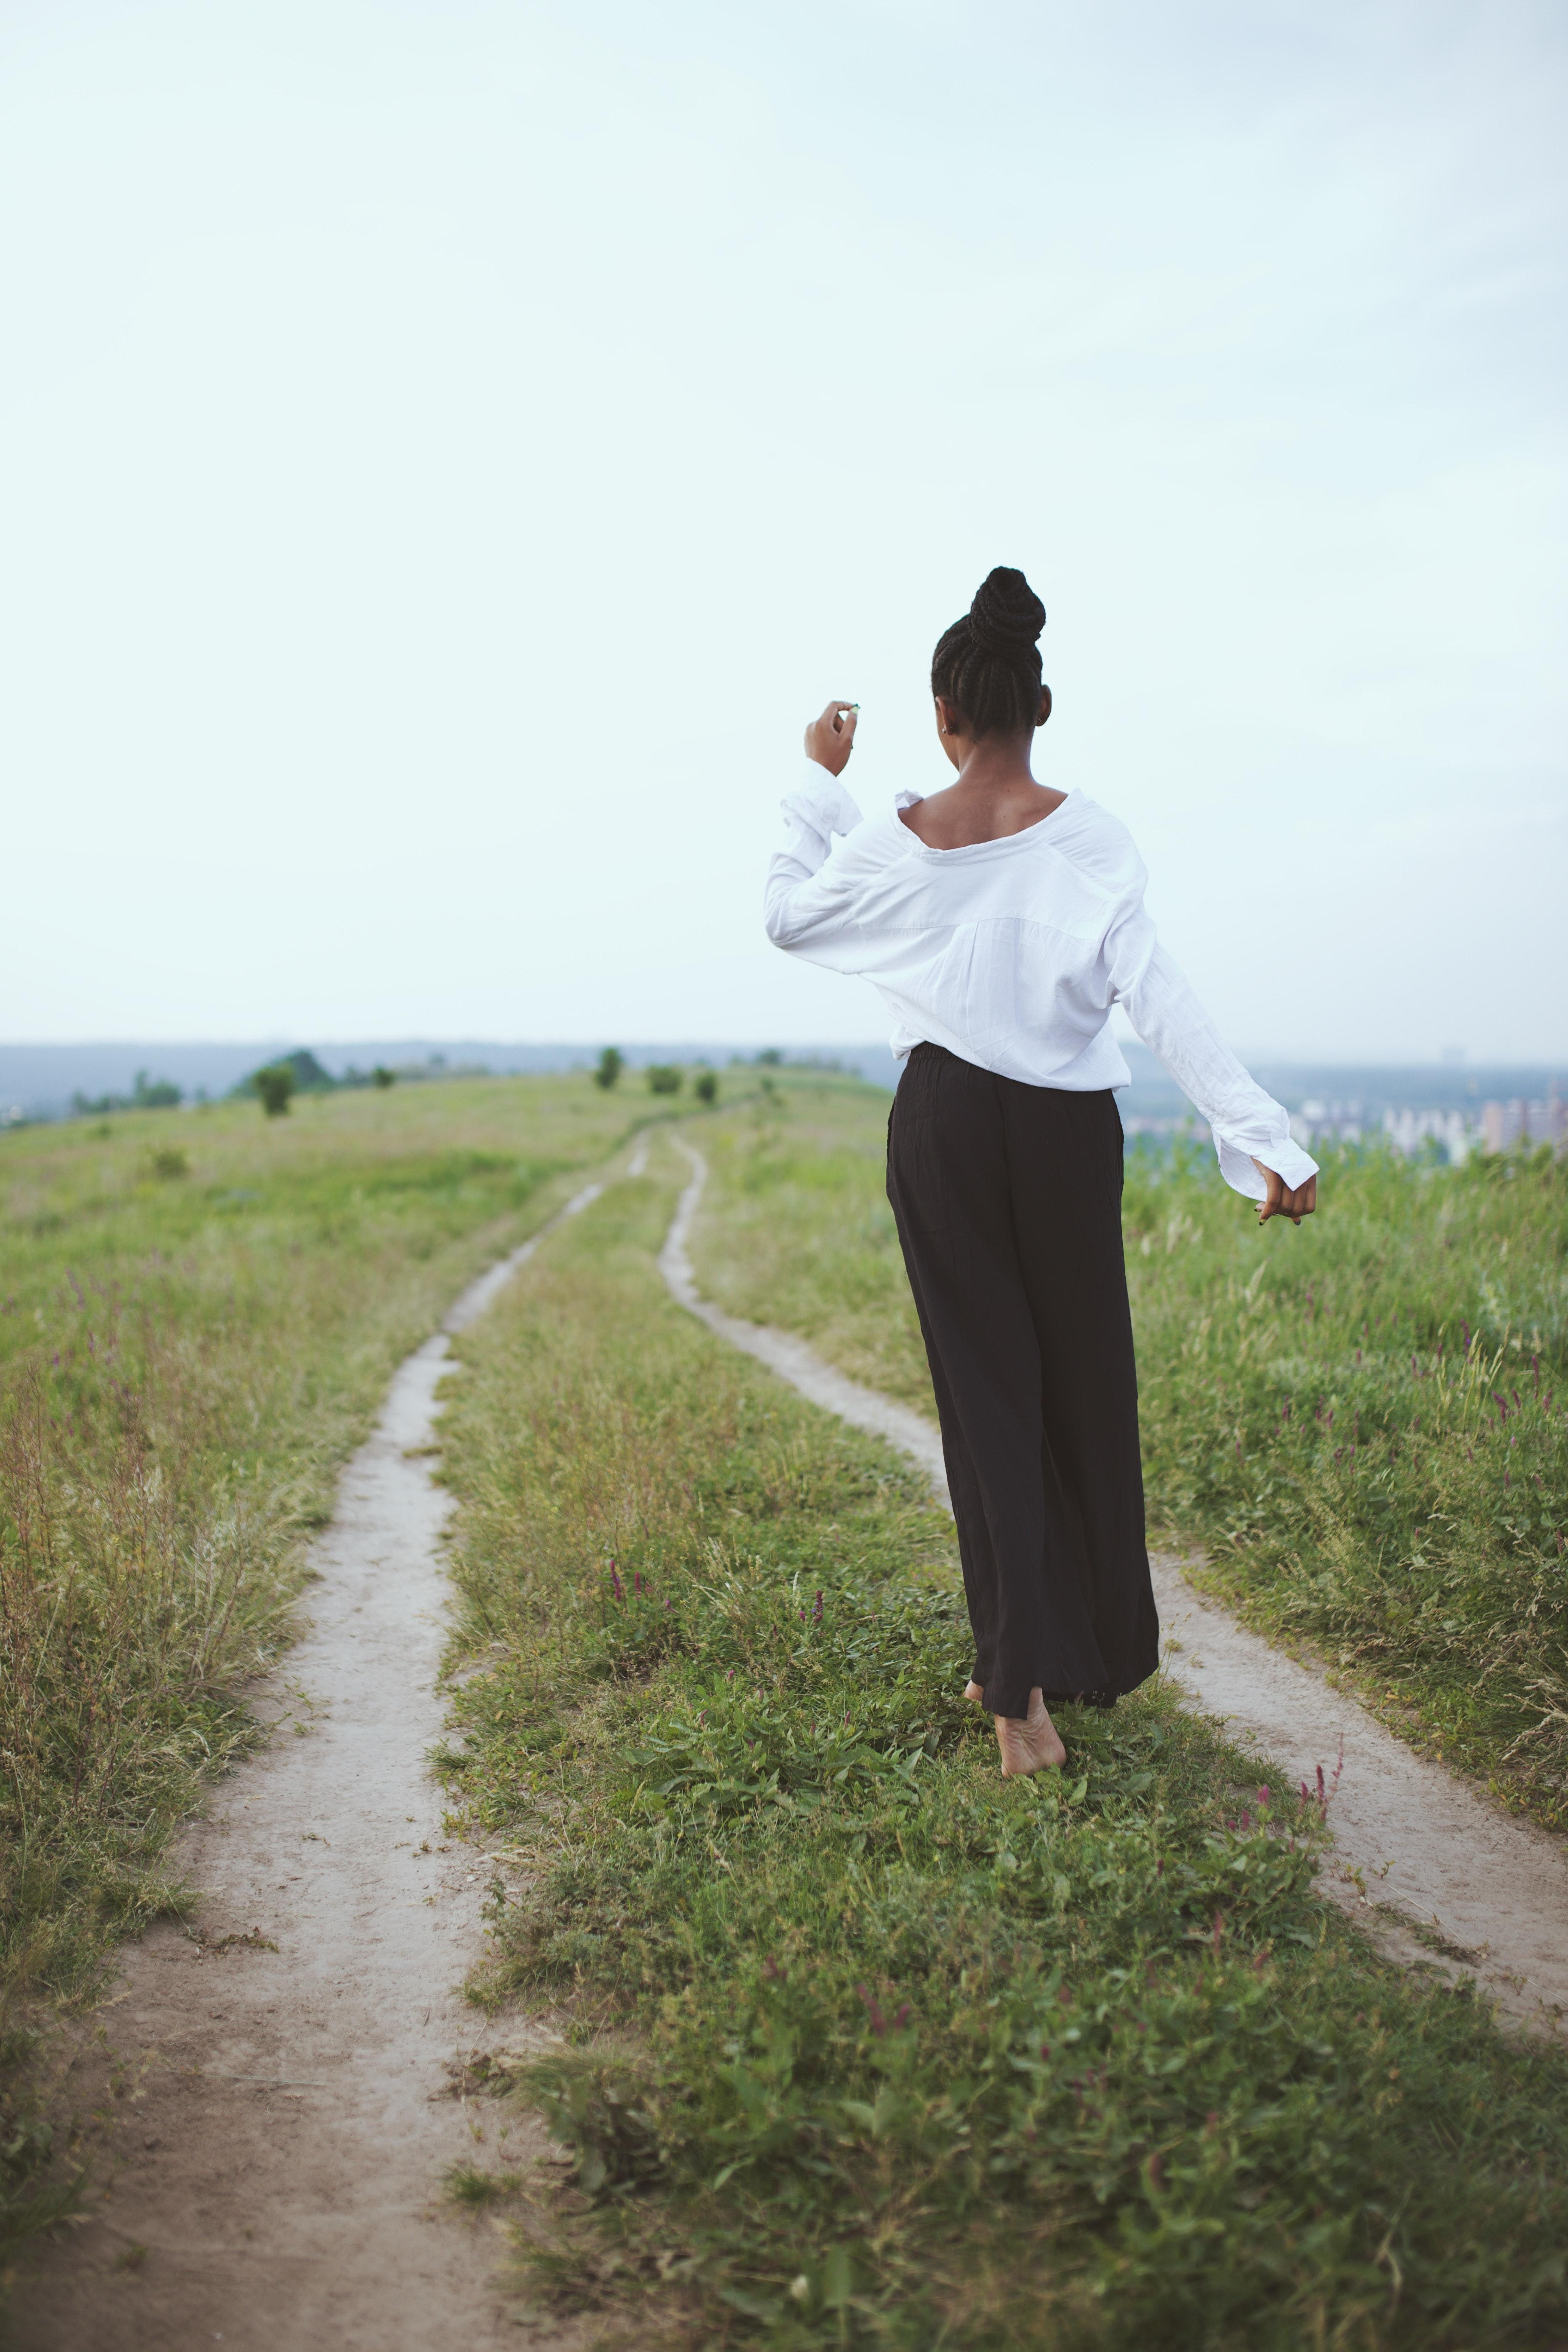 photo-of-woman-walking-on-grass-2399173.jpg